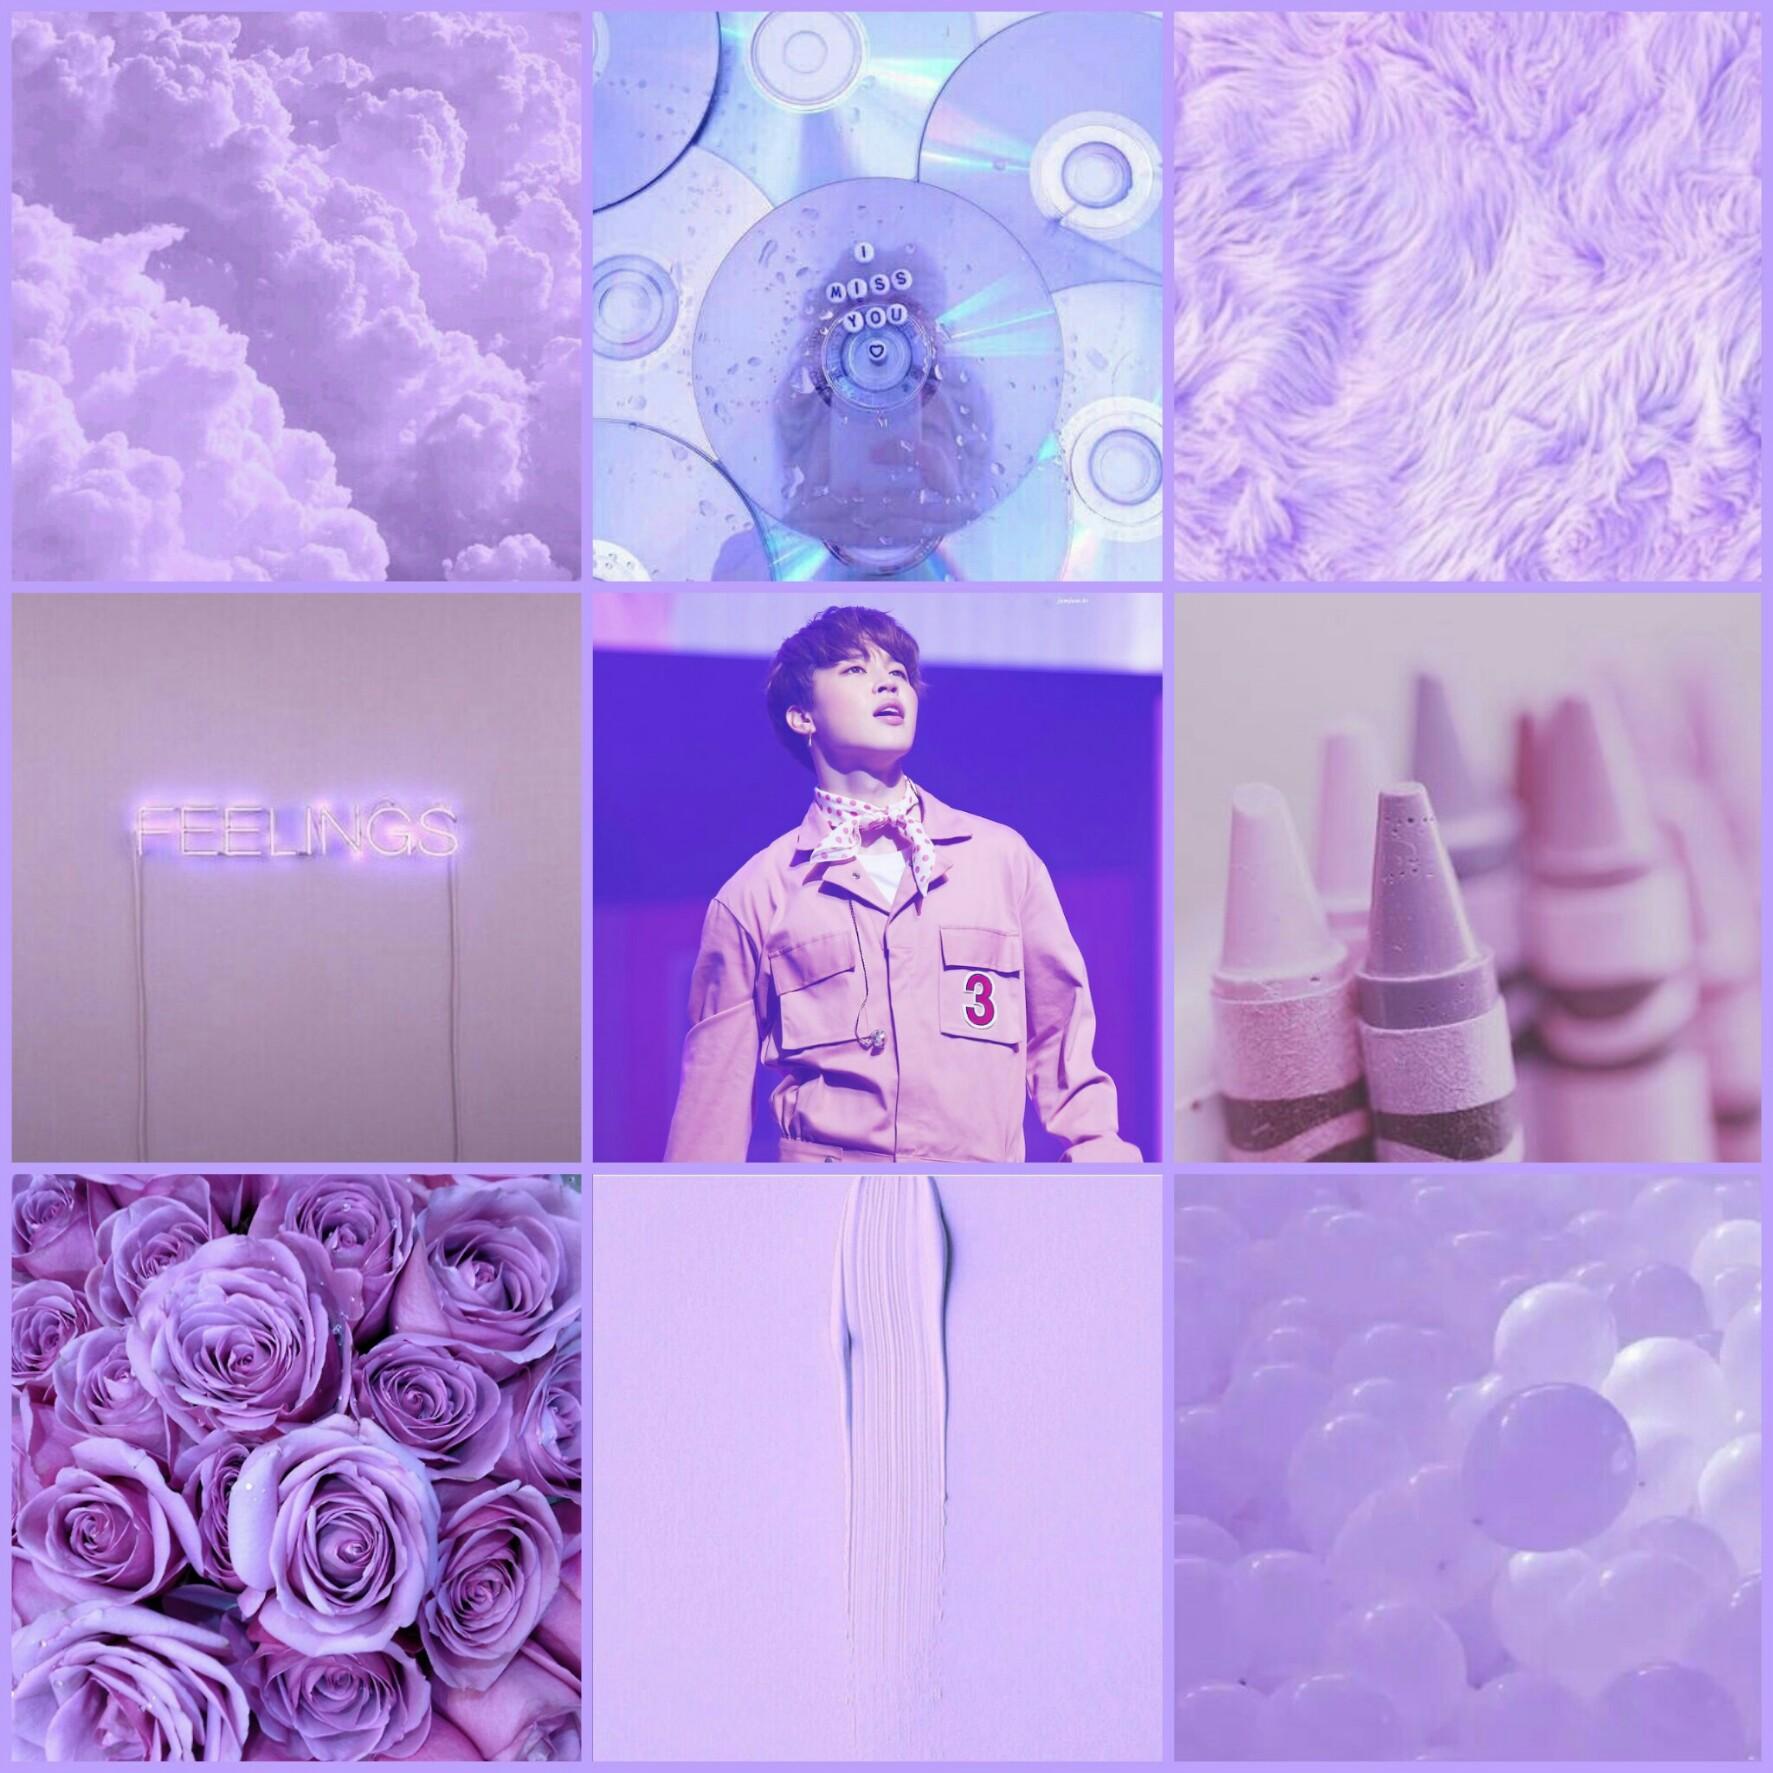 Bts Cute Wallpaper Bts Aesthetic Purple Army Image By Thulovetaetae